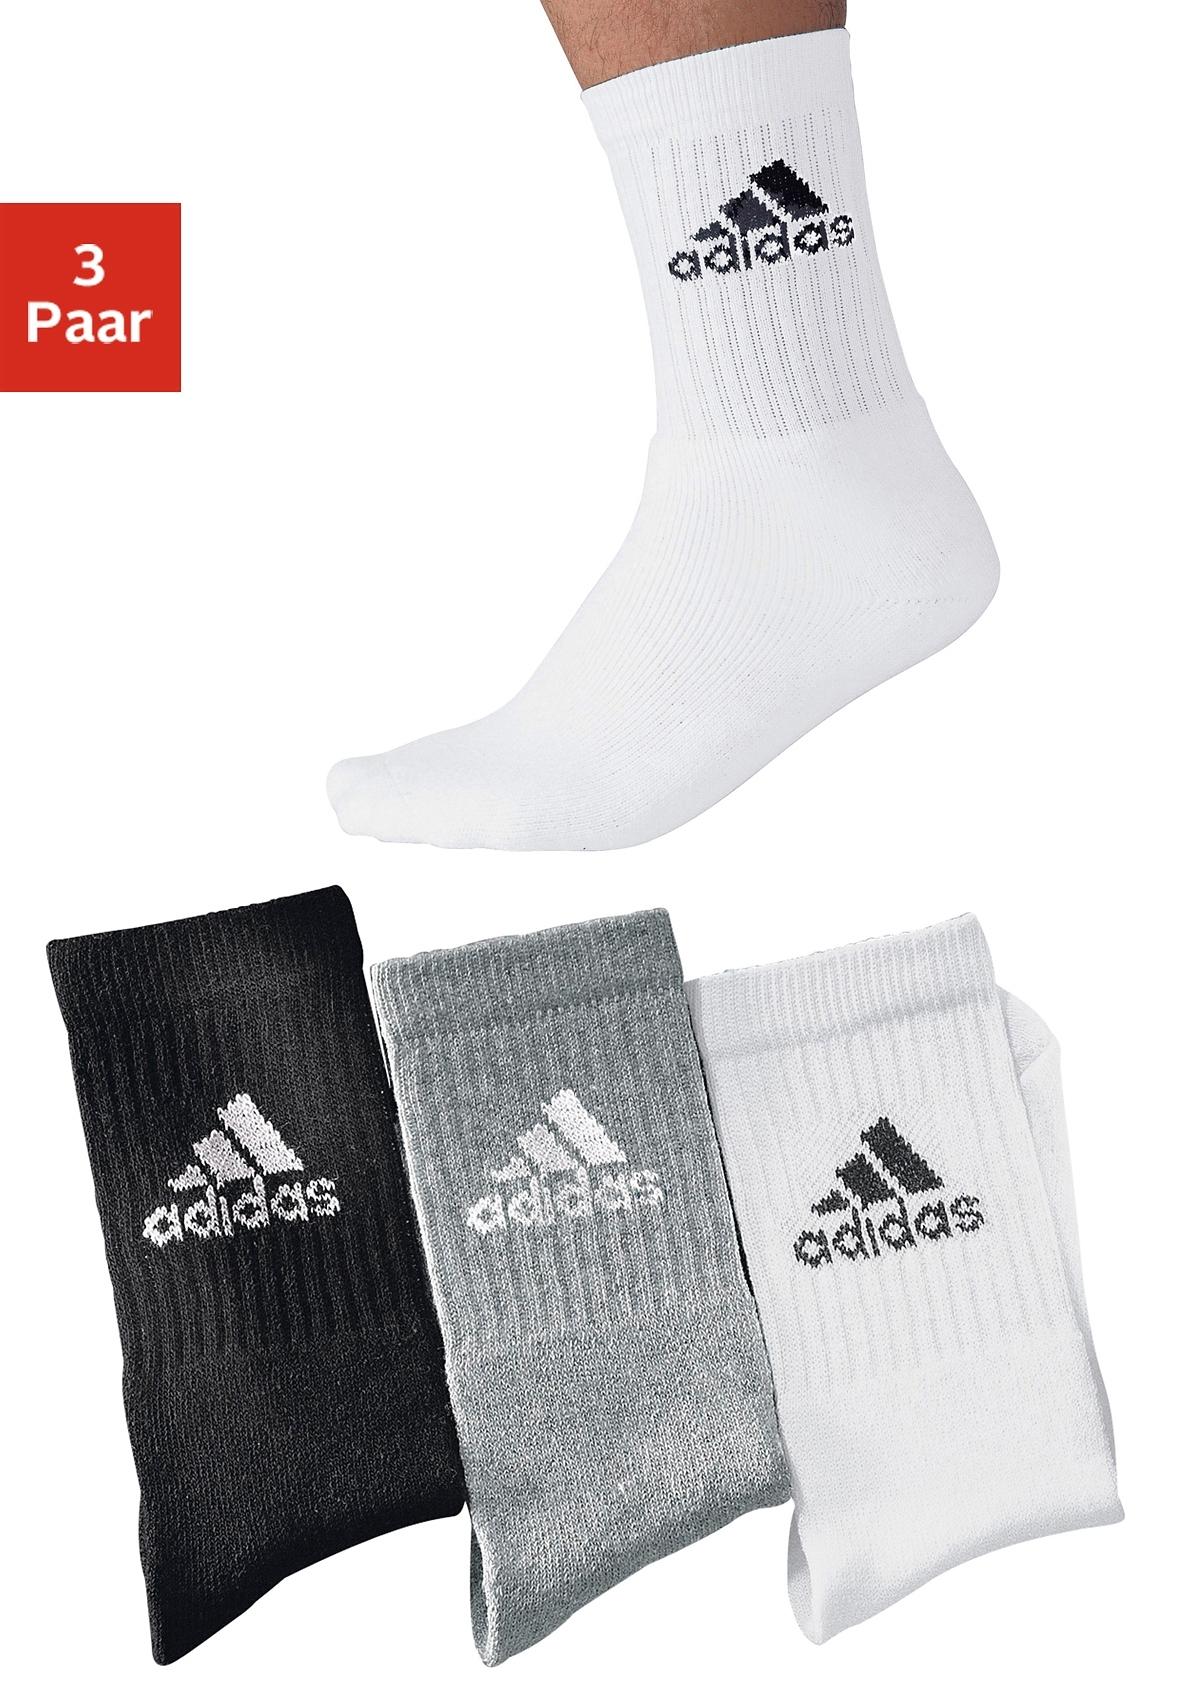 adidas Performance Sportsokken, (3 paar), adidas - verschillende betaalmethodes